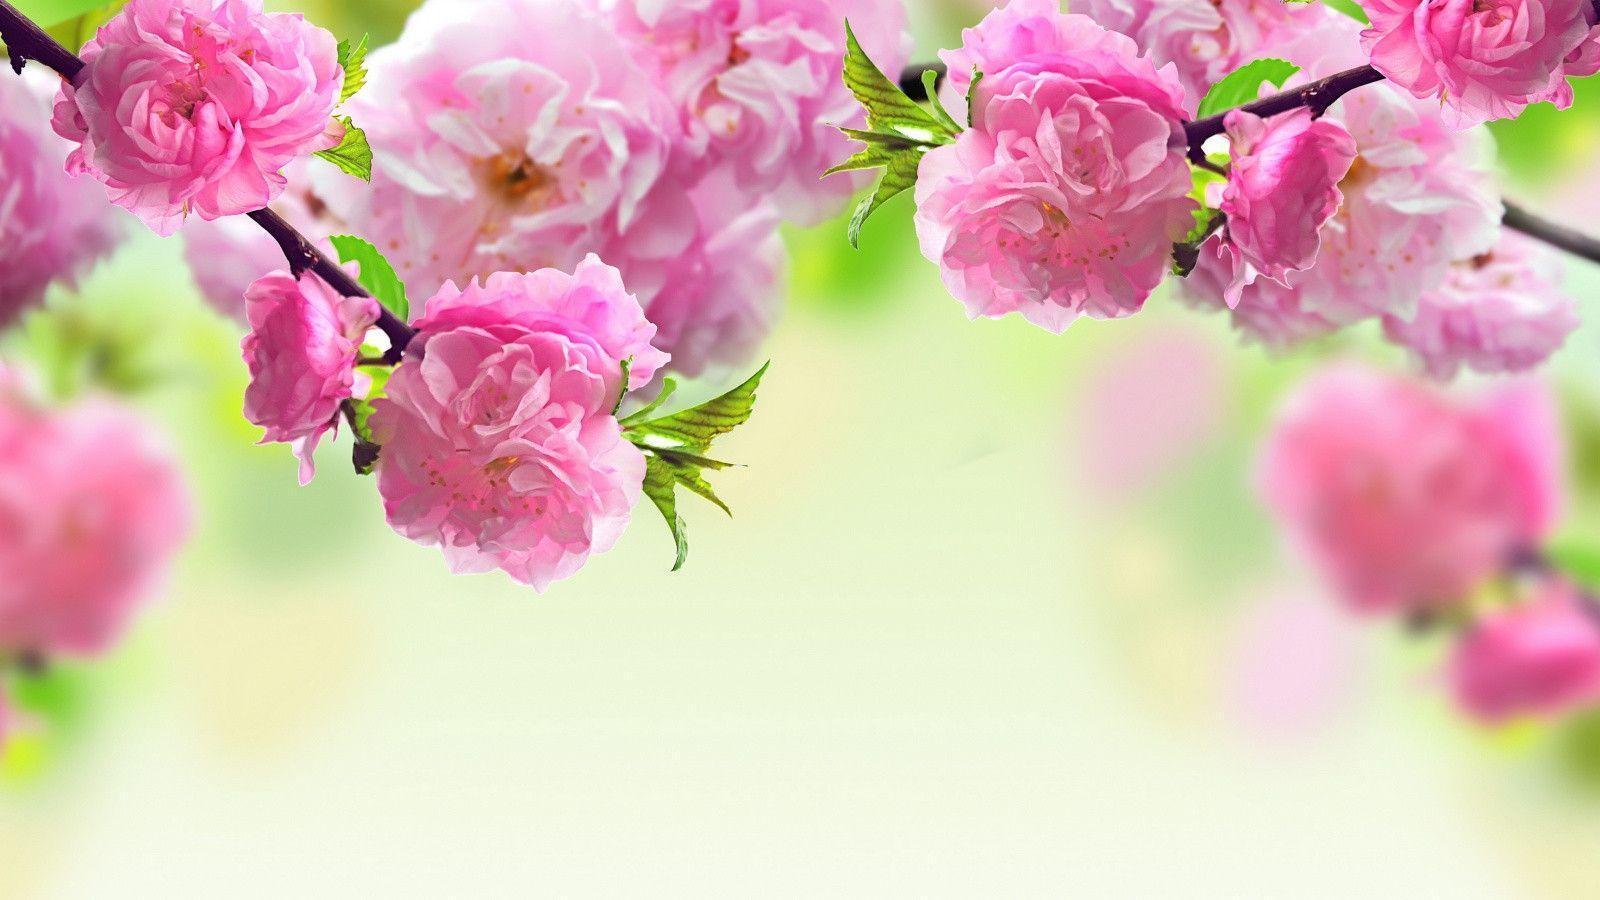 Spring Desktop Wallpapers   Top Spring Desktop Backgrounds 1600x900